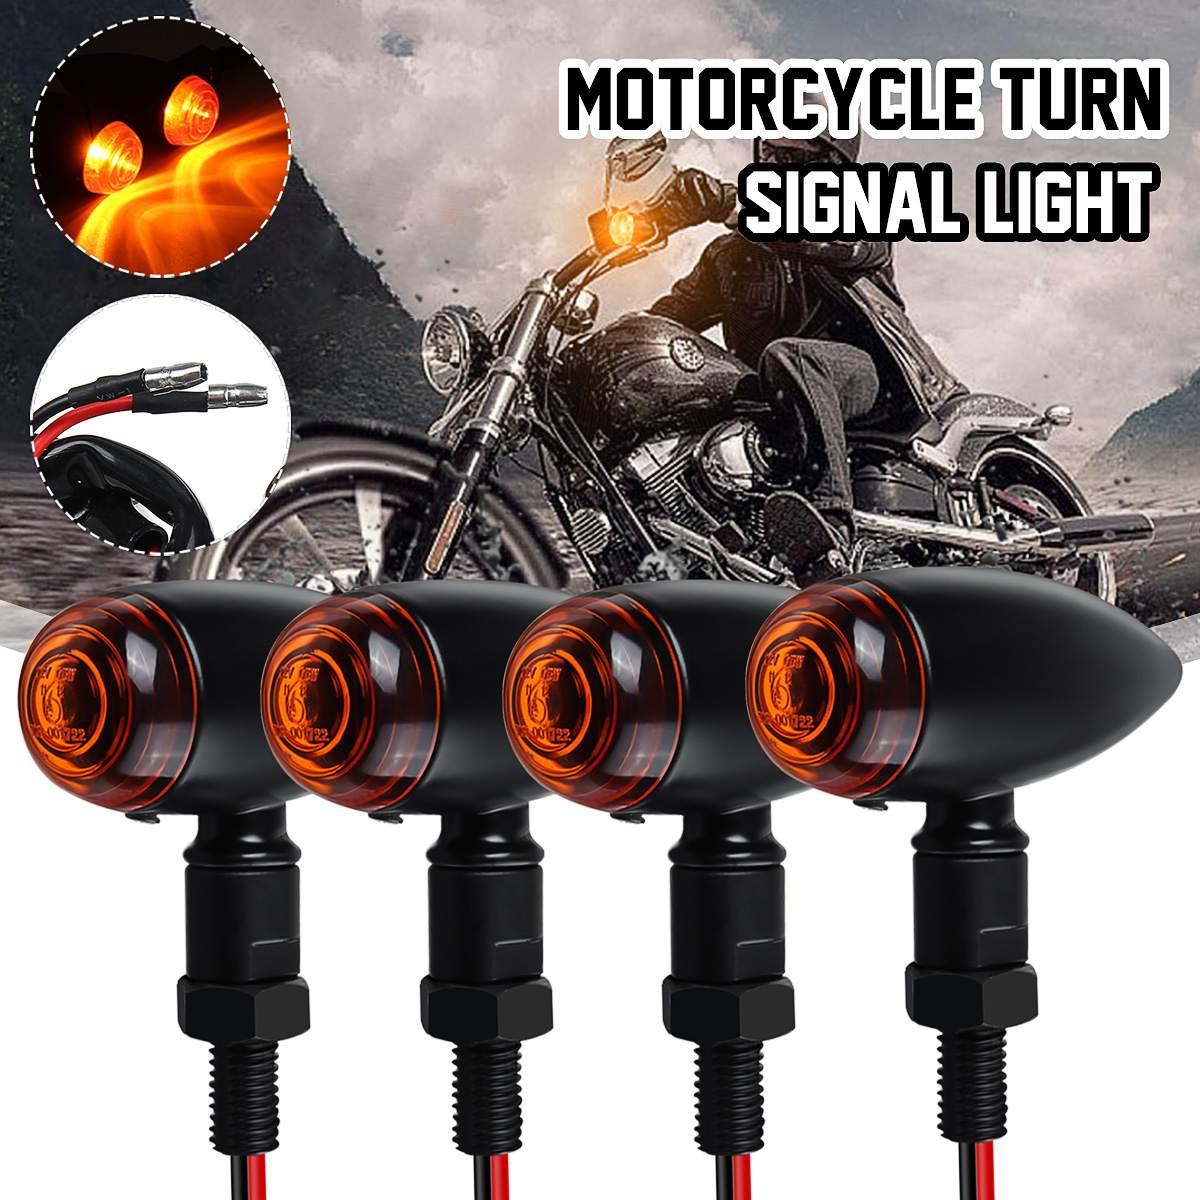 4x Motorcycle Bike Hollow LED Turn Signals Light Amber Blinker Indicator Lamp